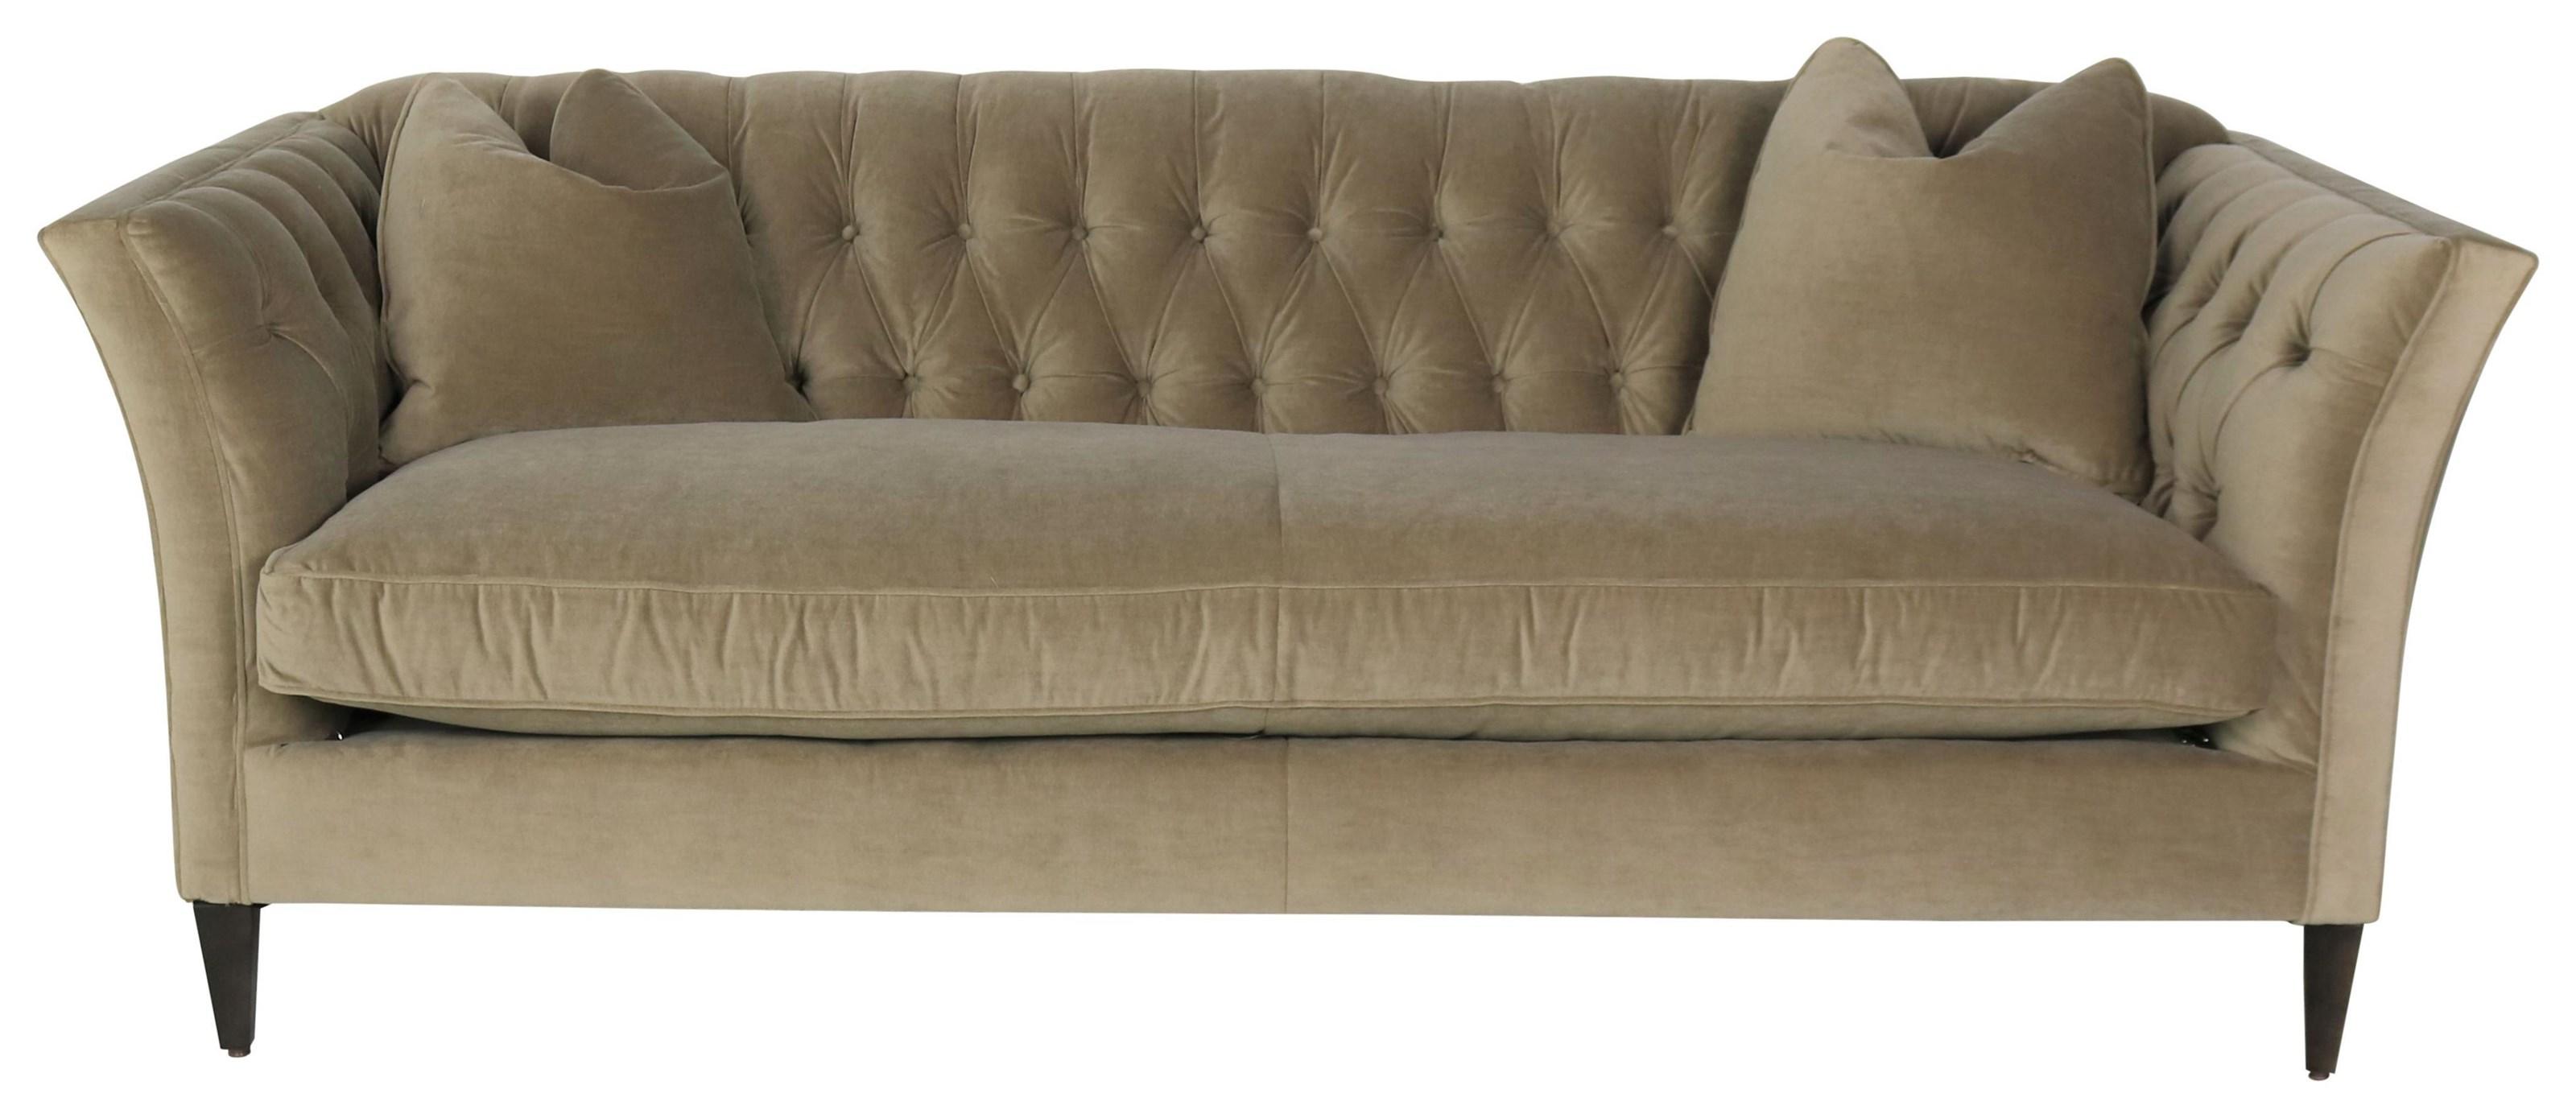 Margot Sofa by Robin Bruce at Sprintz Furniture